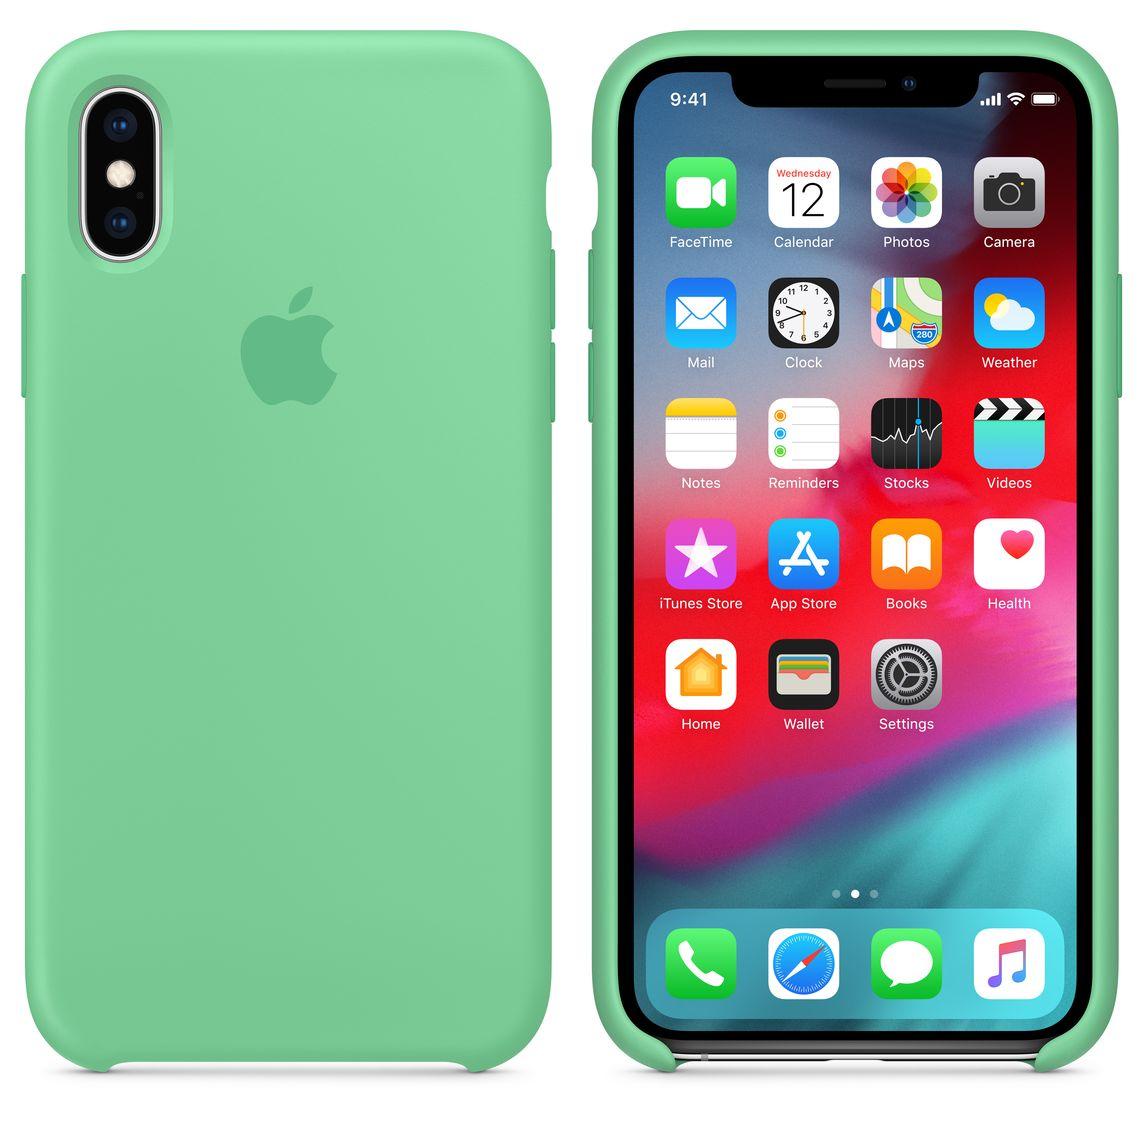 Custodia in silicone per iPhone XS - Verde menta